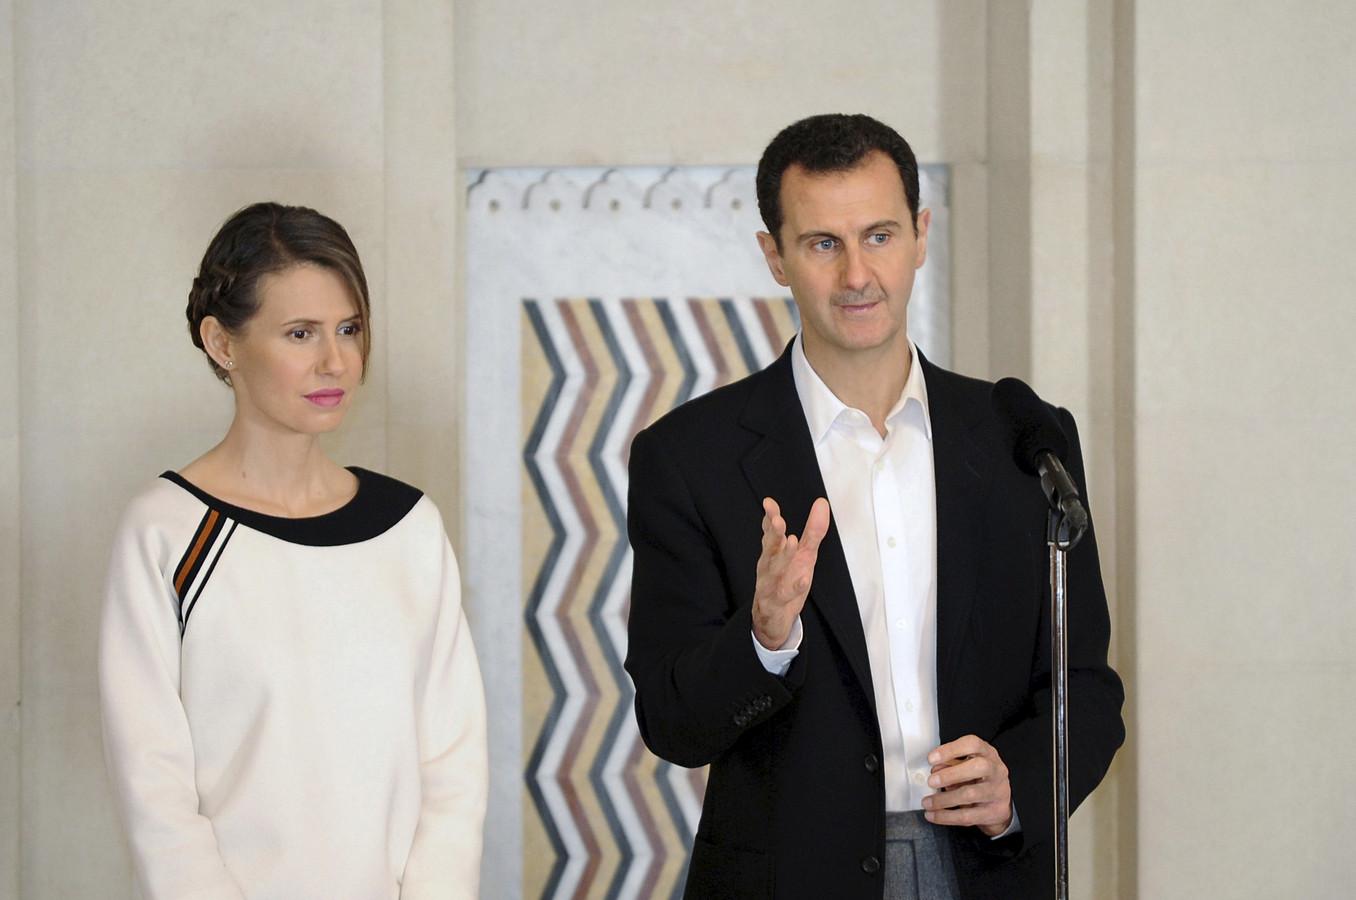 Bachar el-Assad et son épouse, Asma